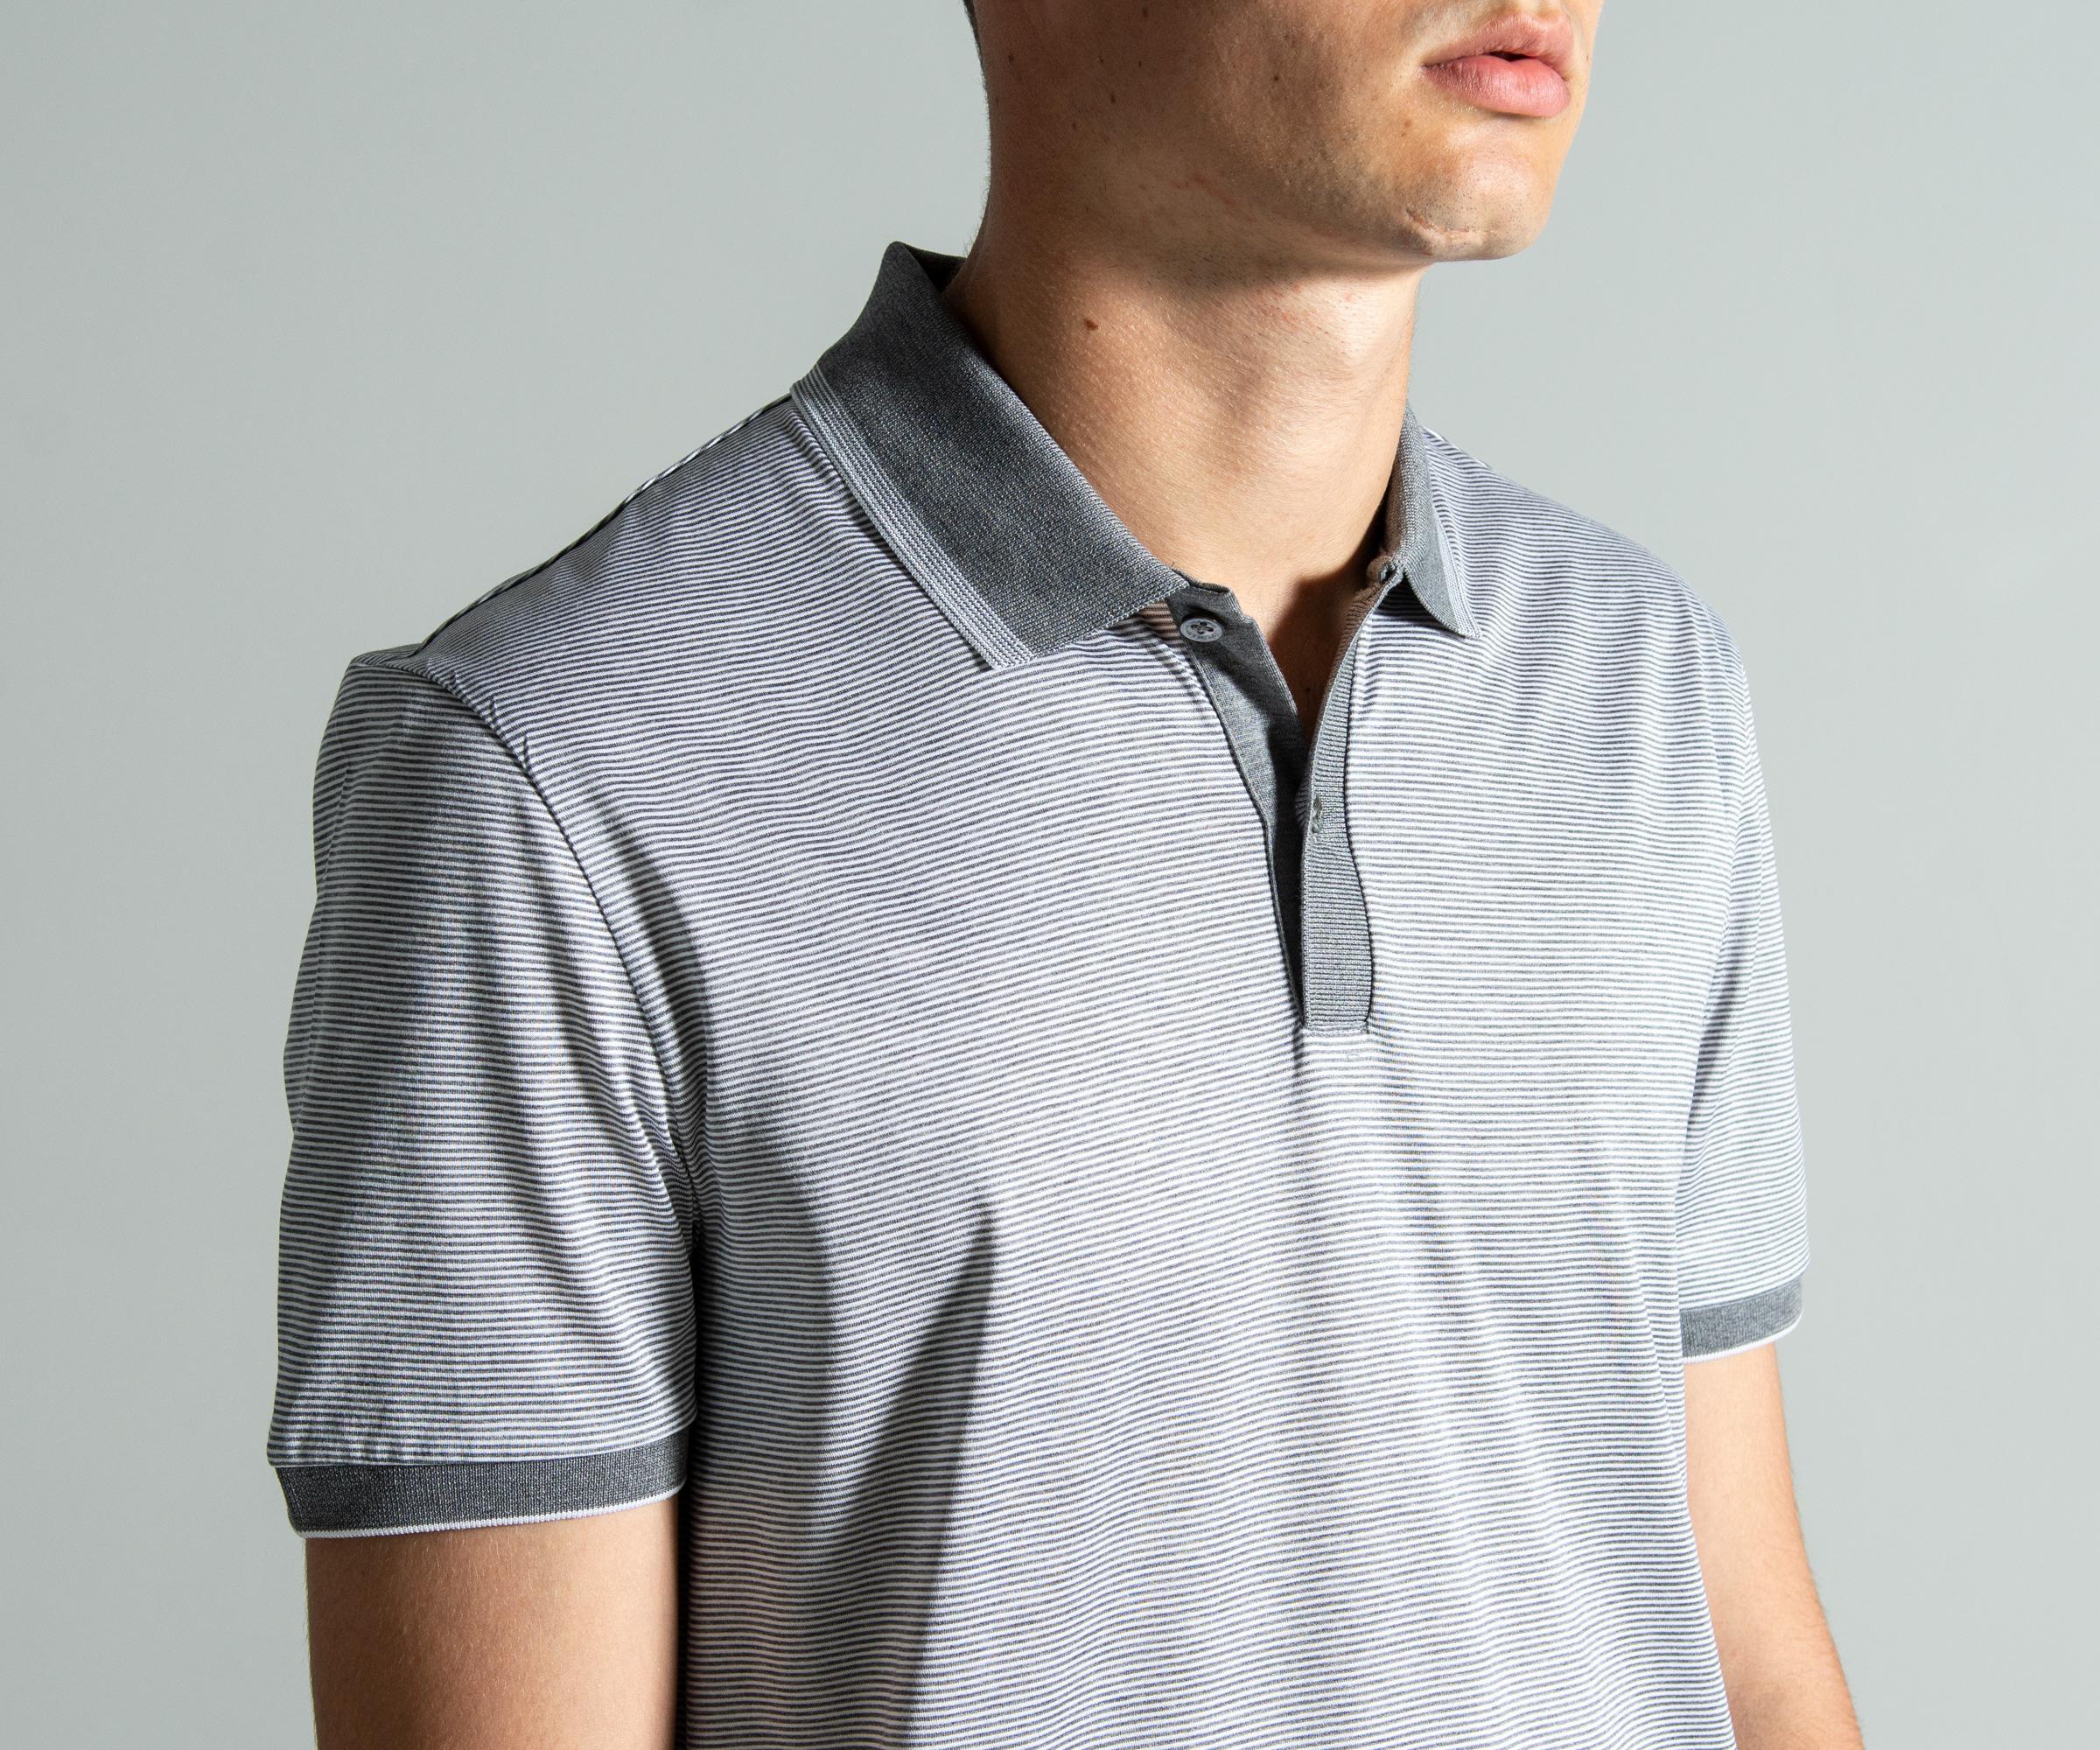 09308fa86 Hugo Boss Polo Shirts India   Top Mode Depot